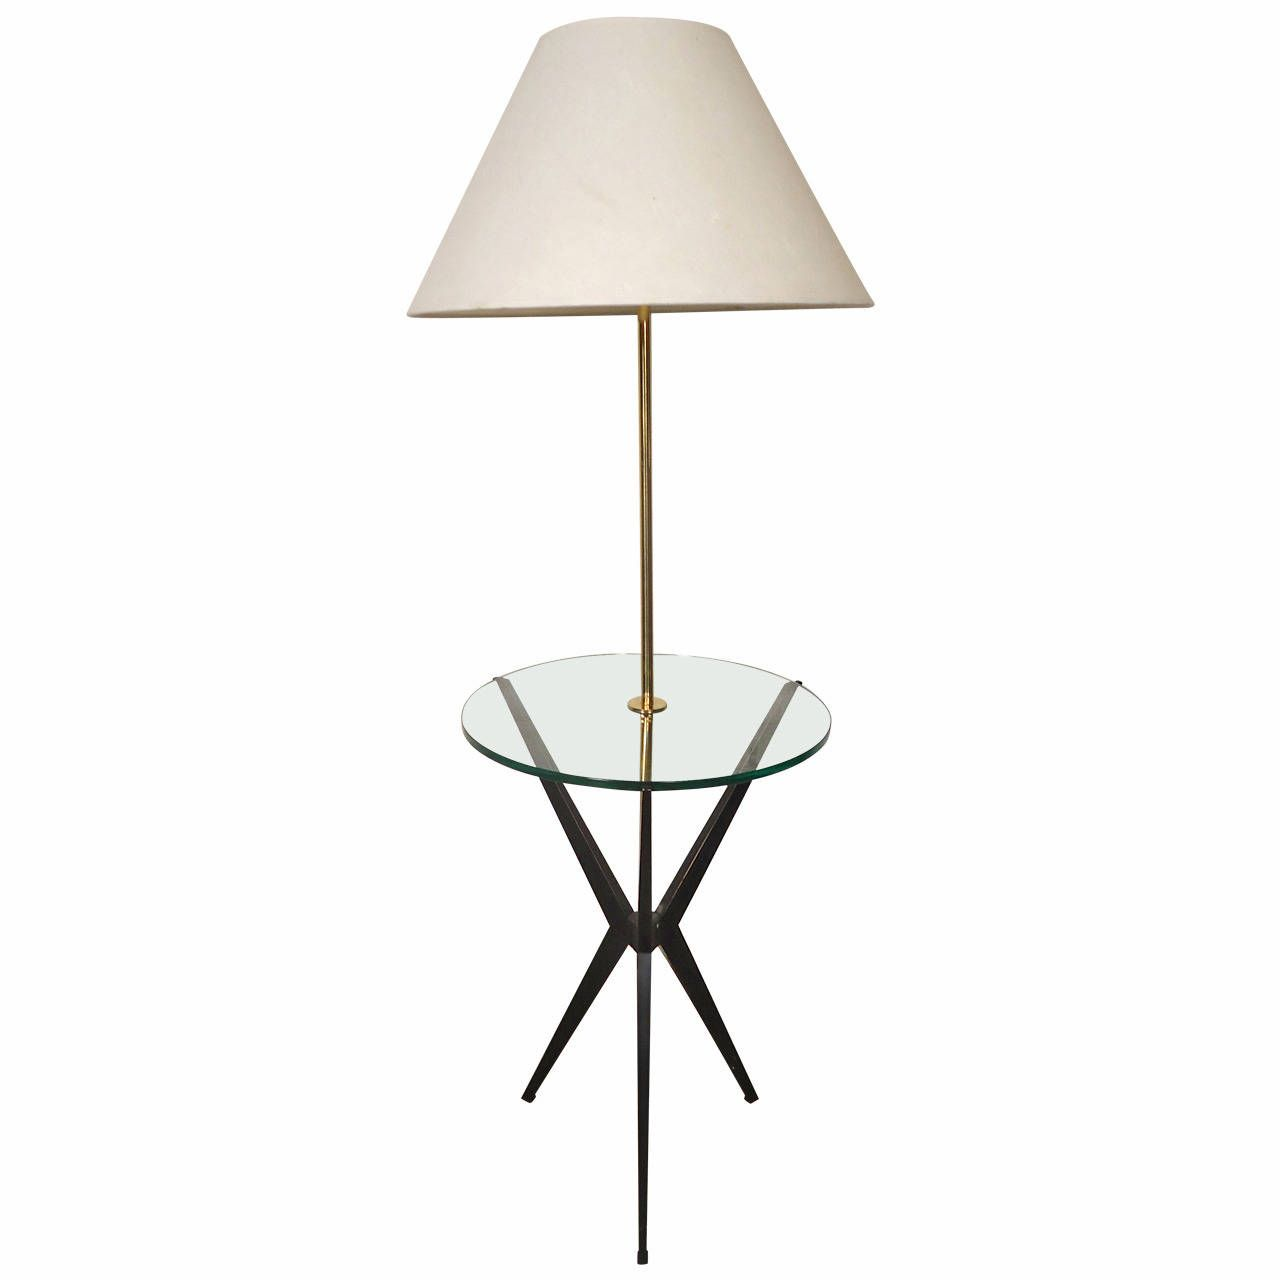 Tray table floor lamp by robert abbey floor lamp tray table floor lamp by robert abbey geotapseo Gallery